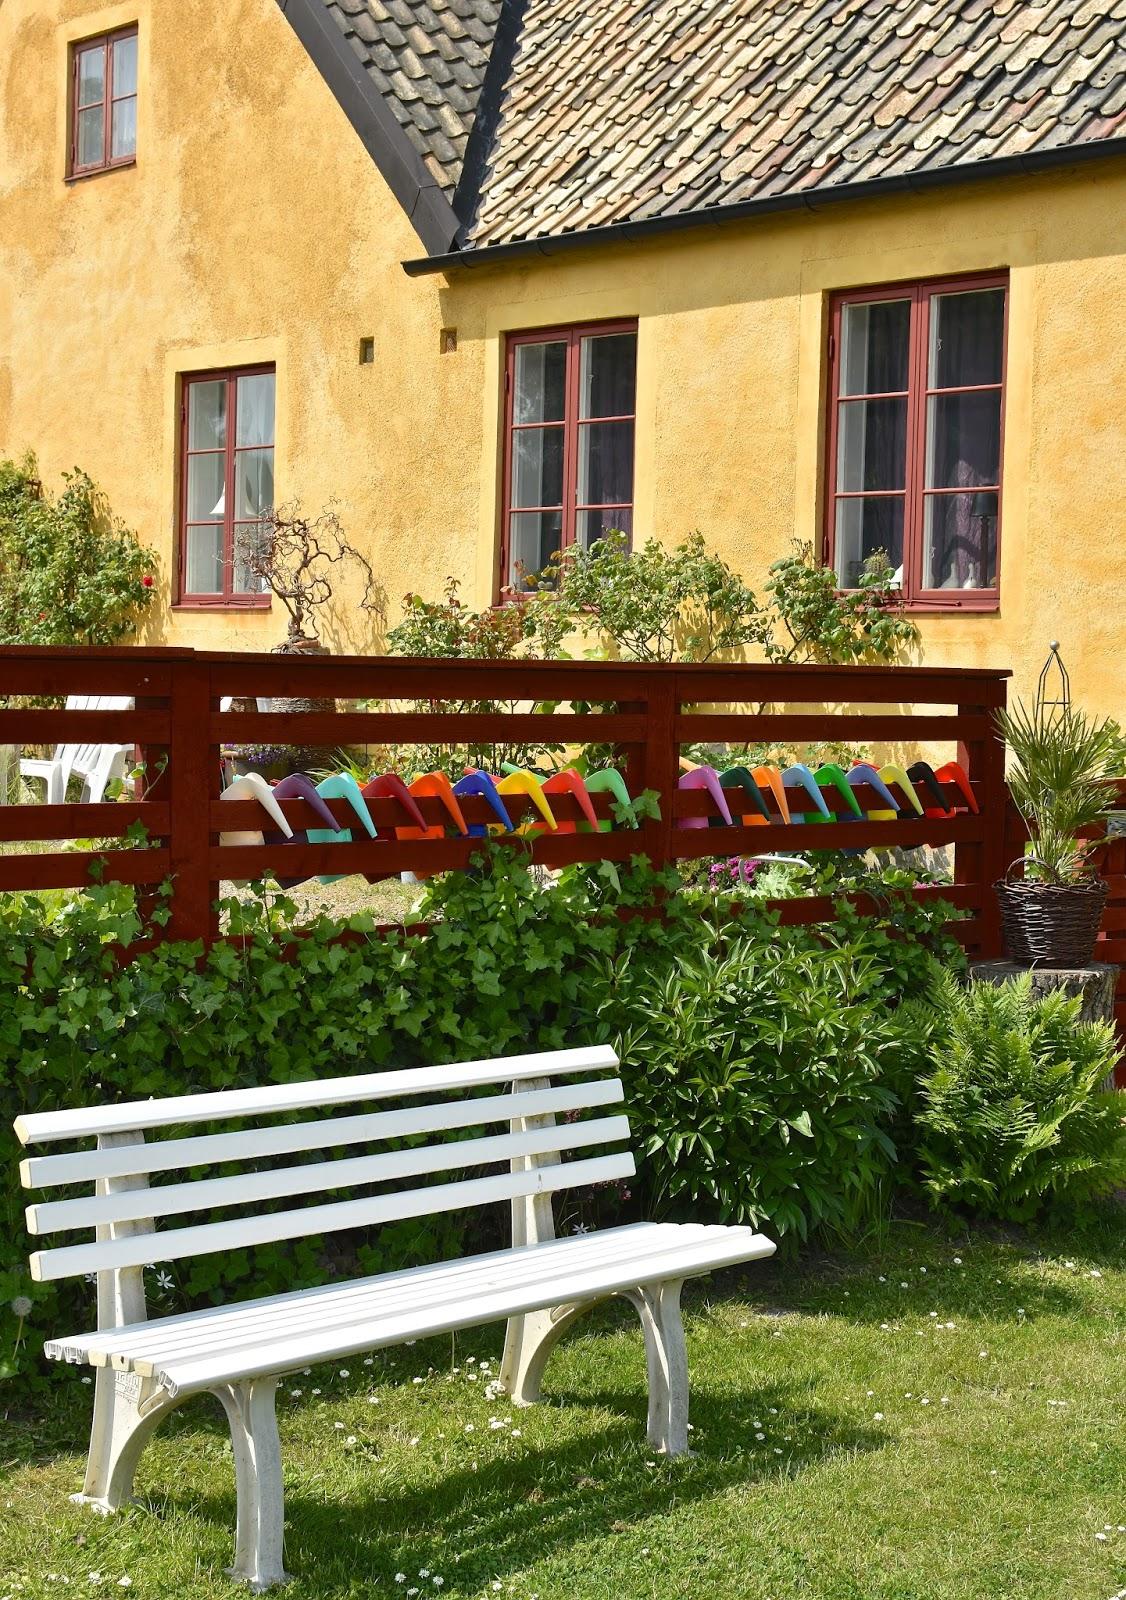 Fröken gröns blogg: maj 2016